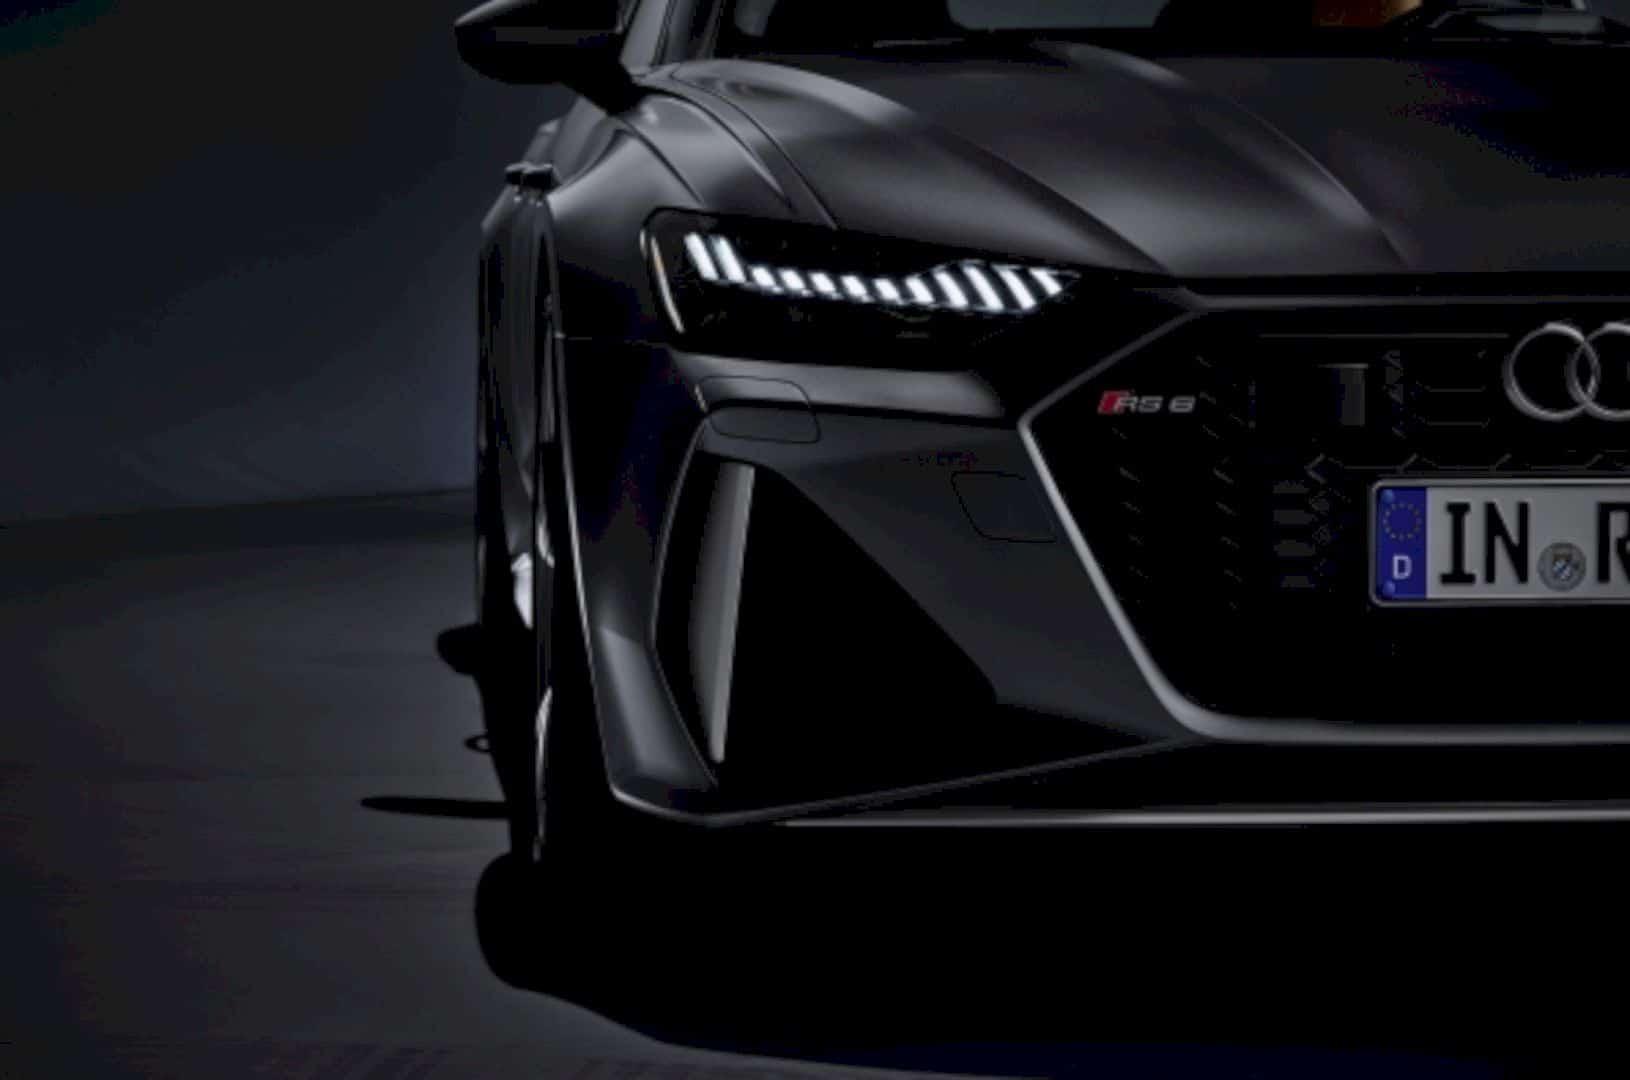 Audi RS 6 Avant 7